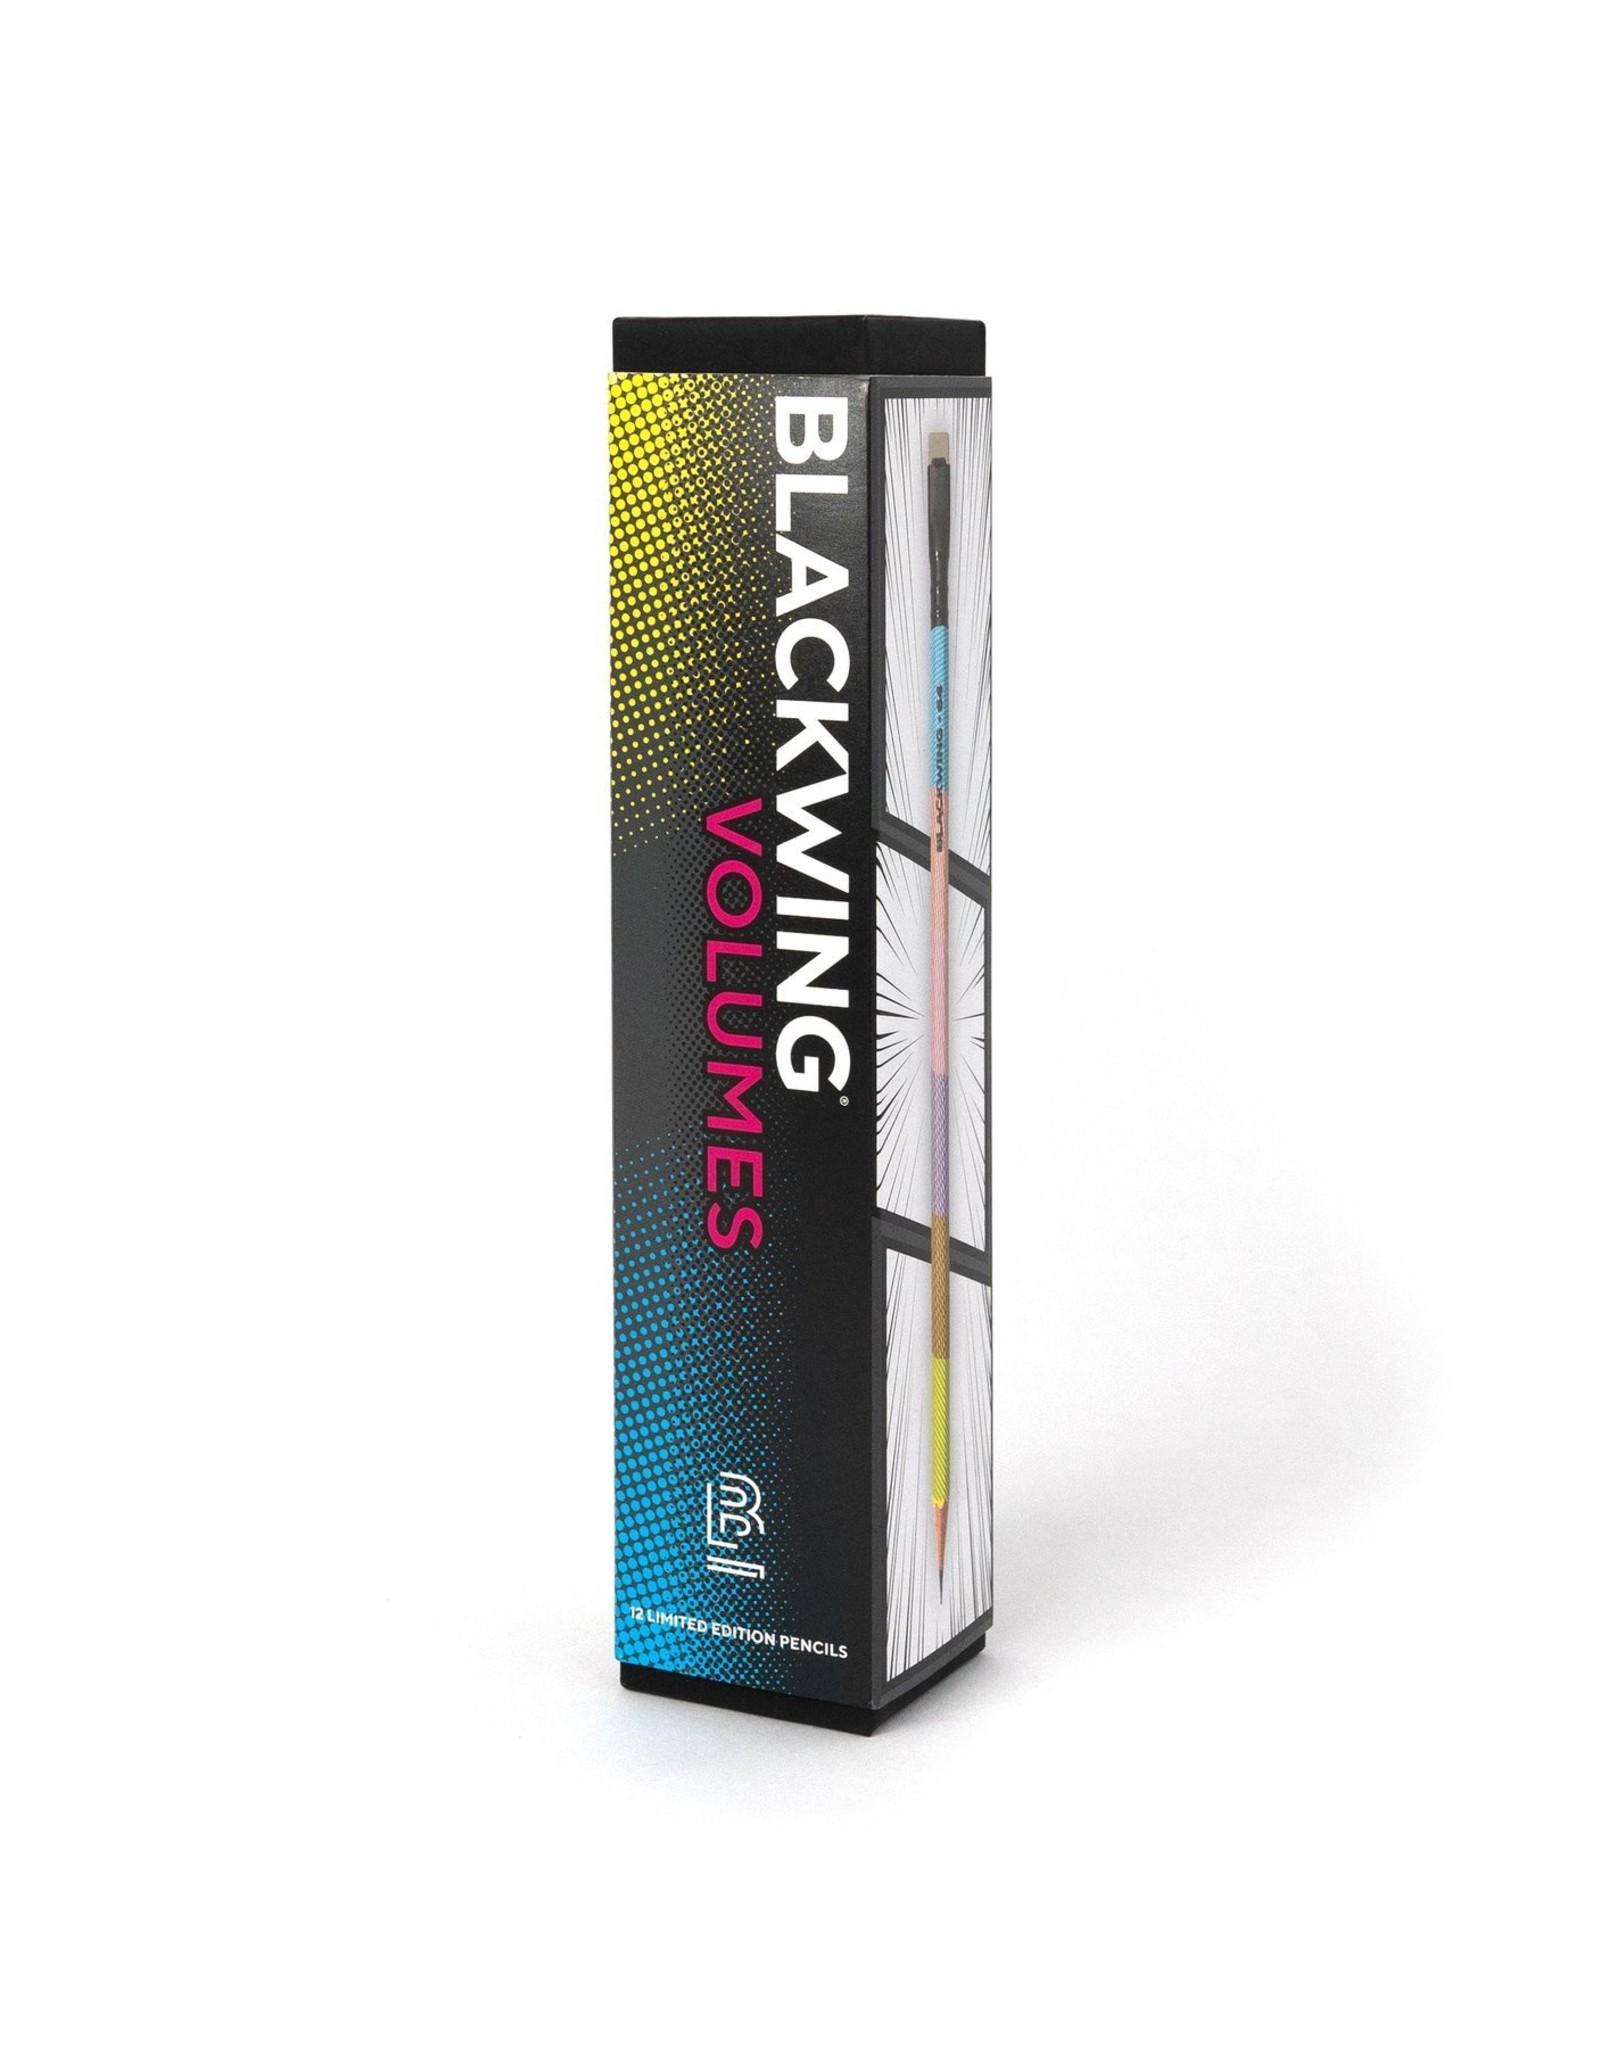 Blackwing Blackwing Volumes